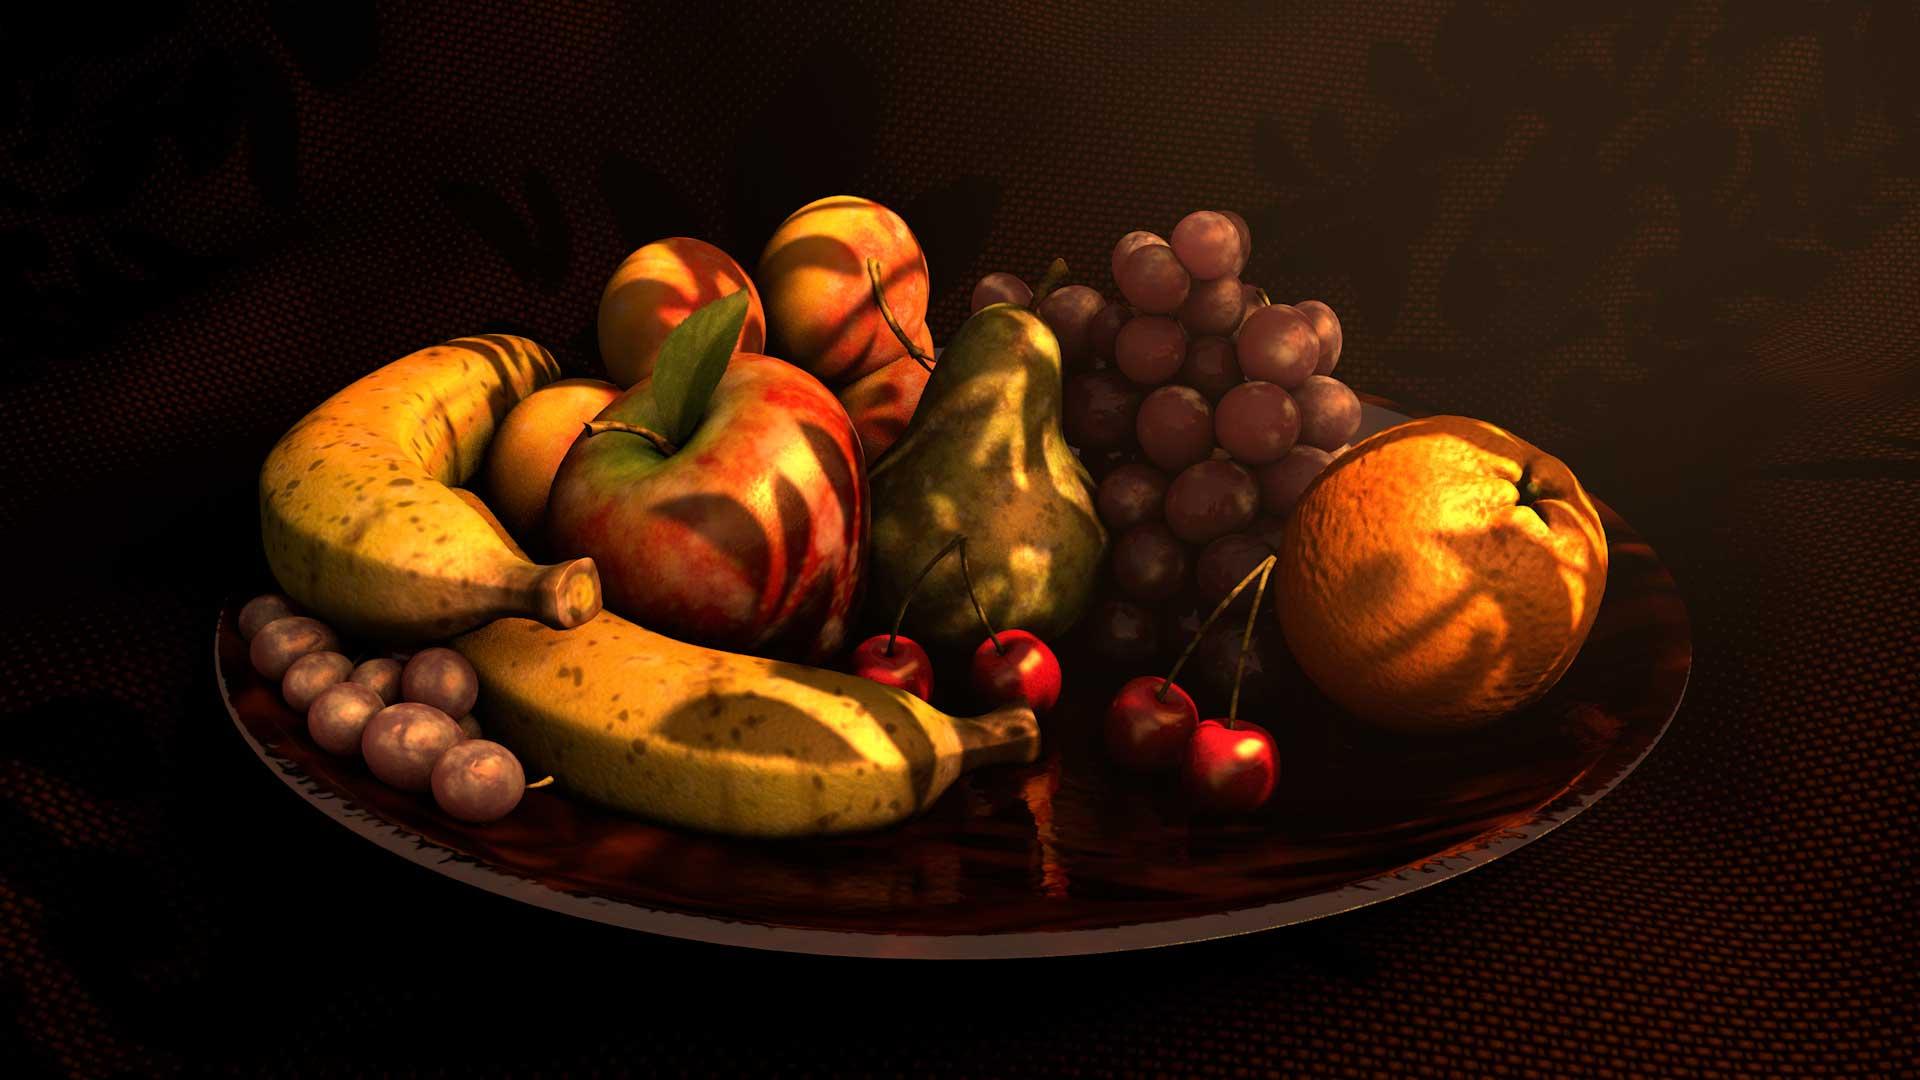 Pixelwish, 3D Design, Still Life, Fruitscale